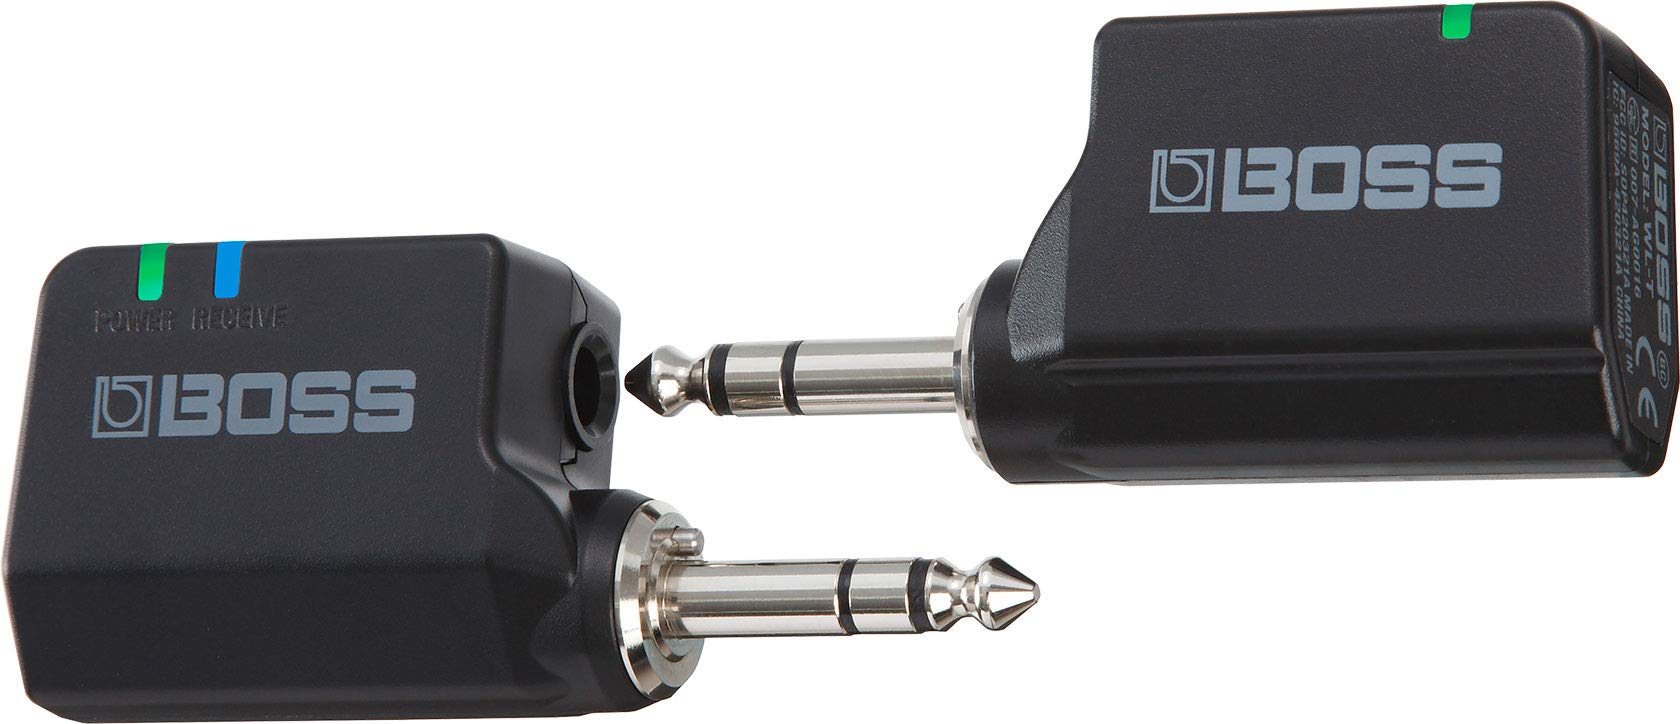 BOSS Wireless System (WL-20) by BOSS Audio Systems